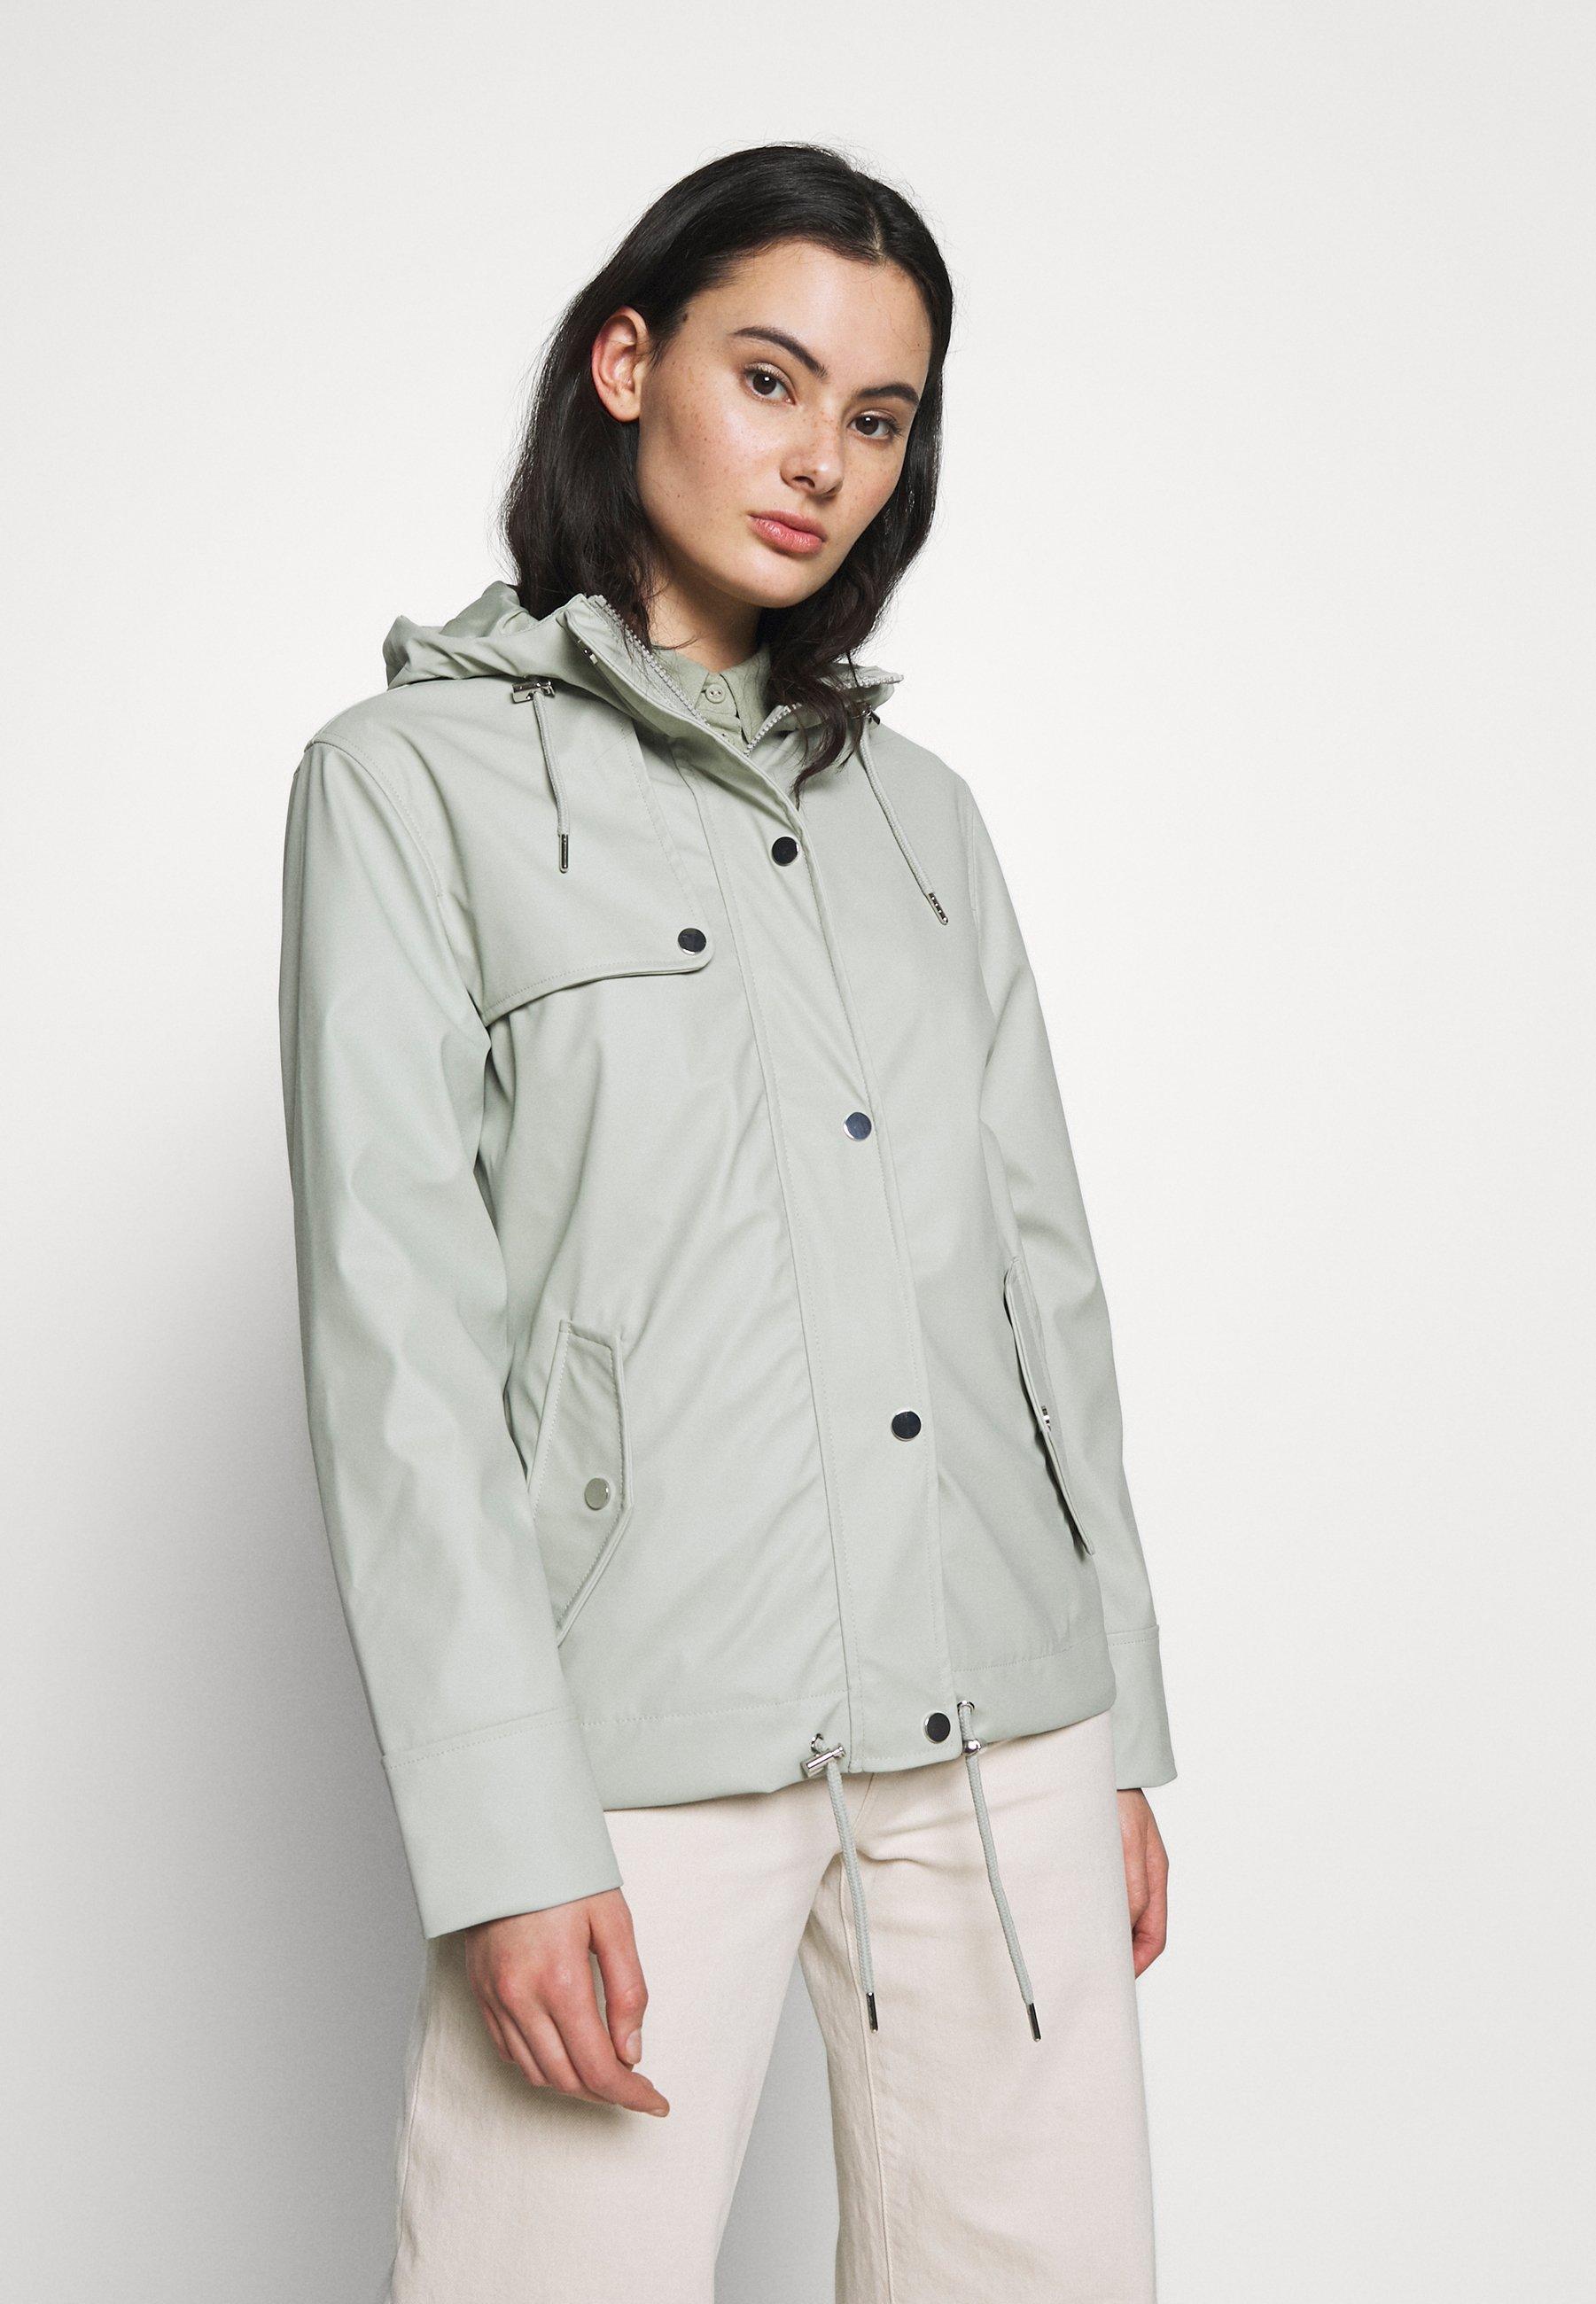 Zizzi Jakker | Damer | Køb din nye jakke online på Zalando.dk